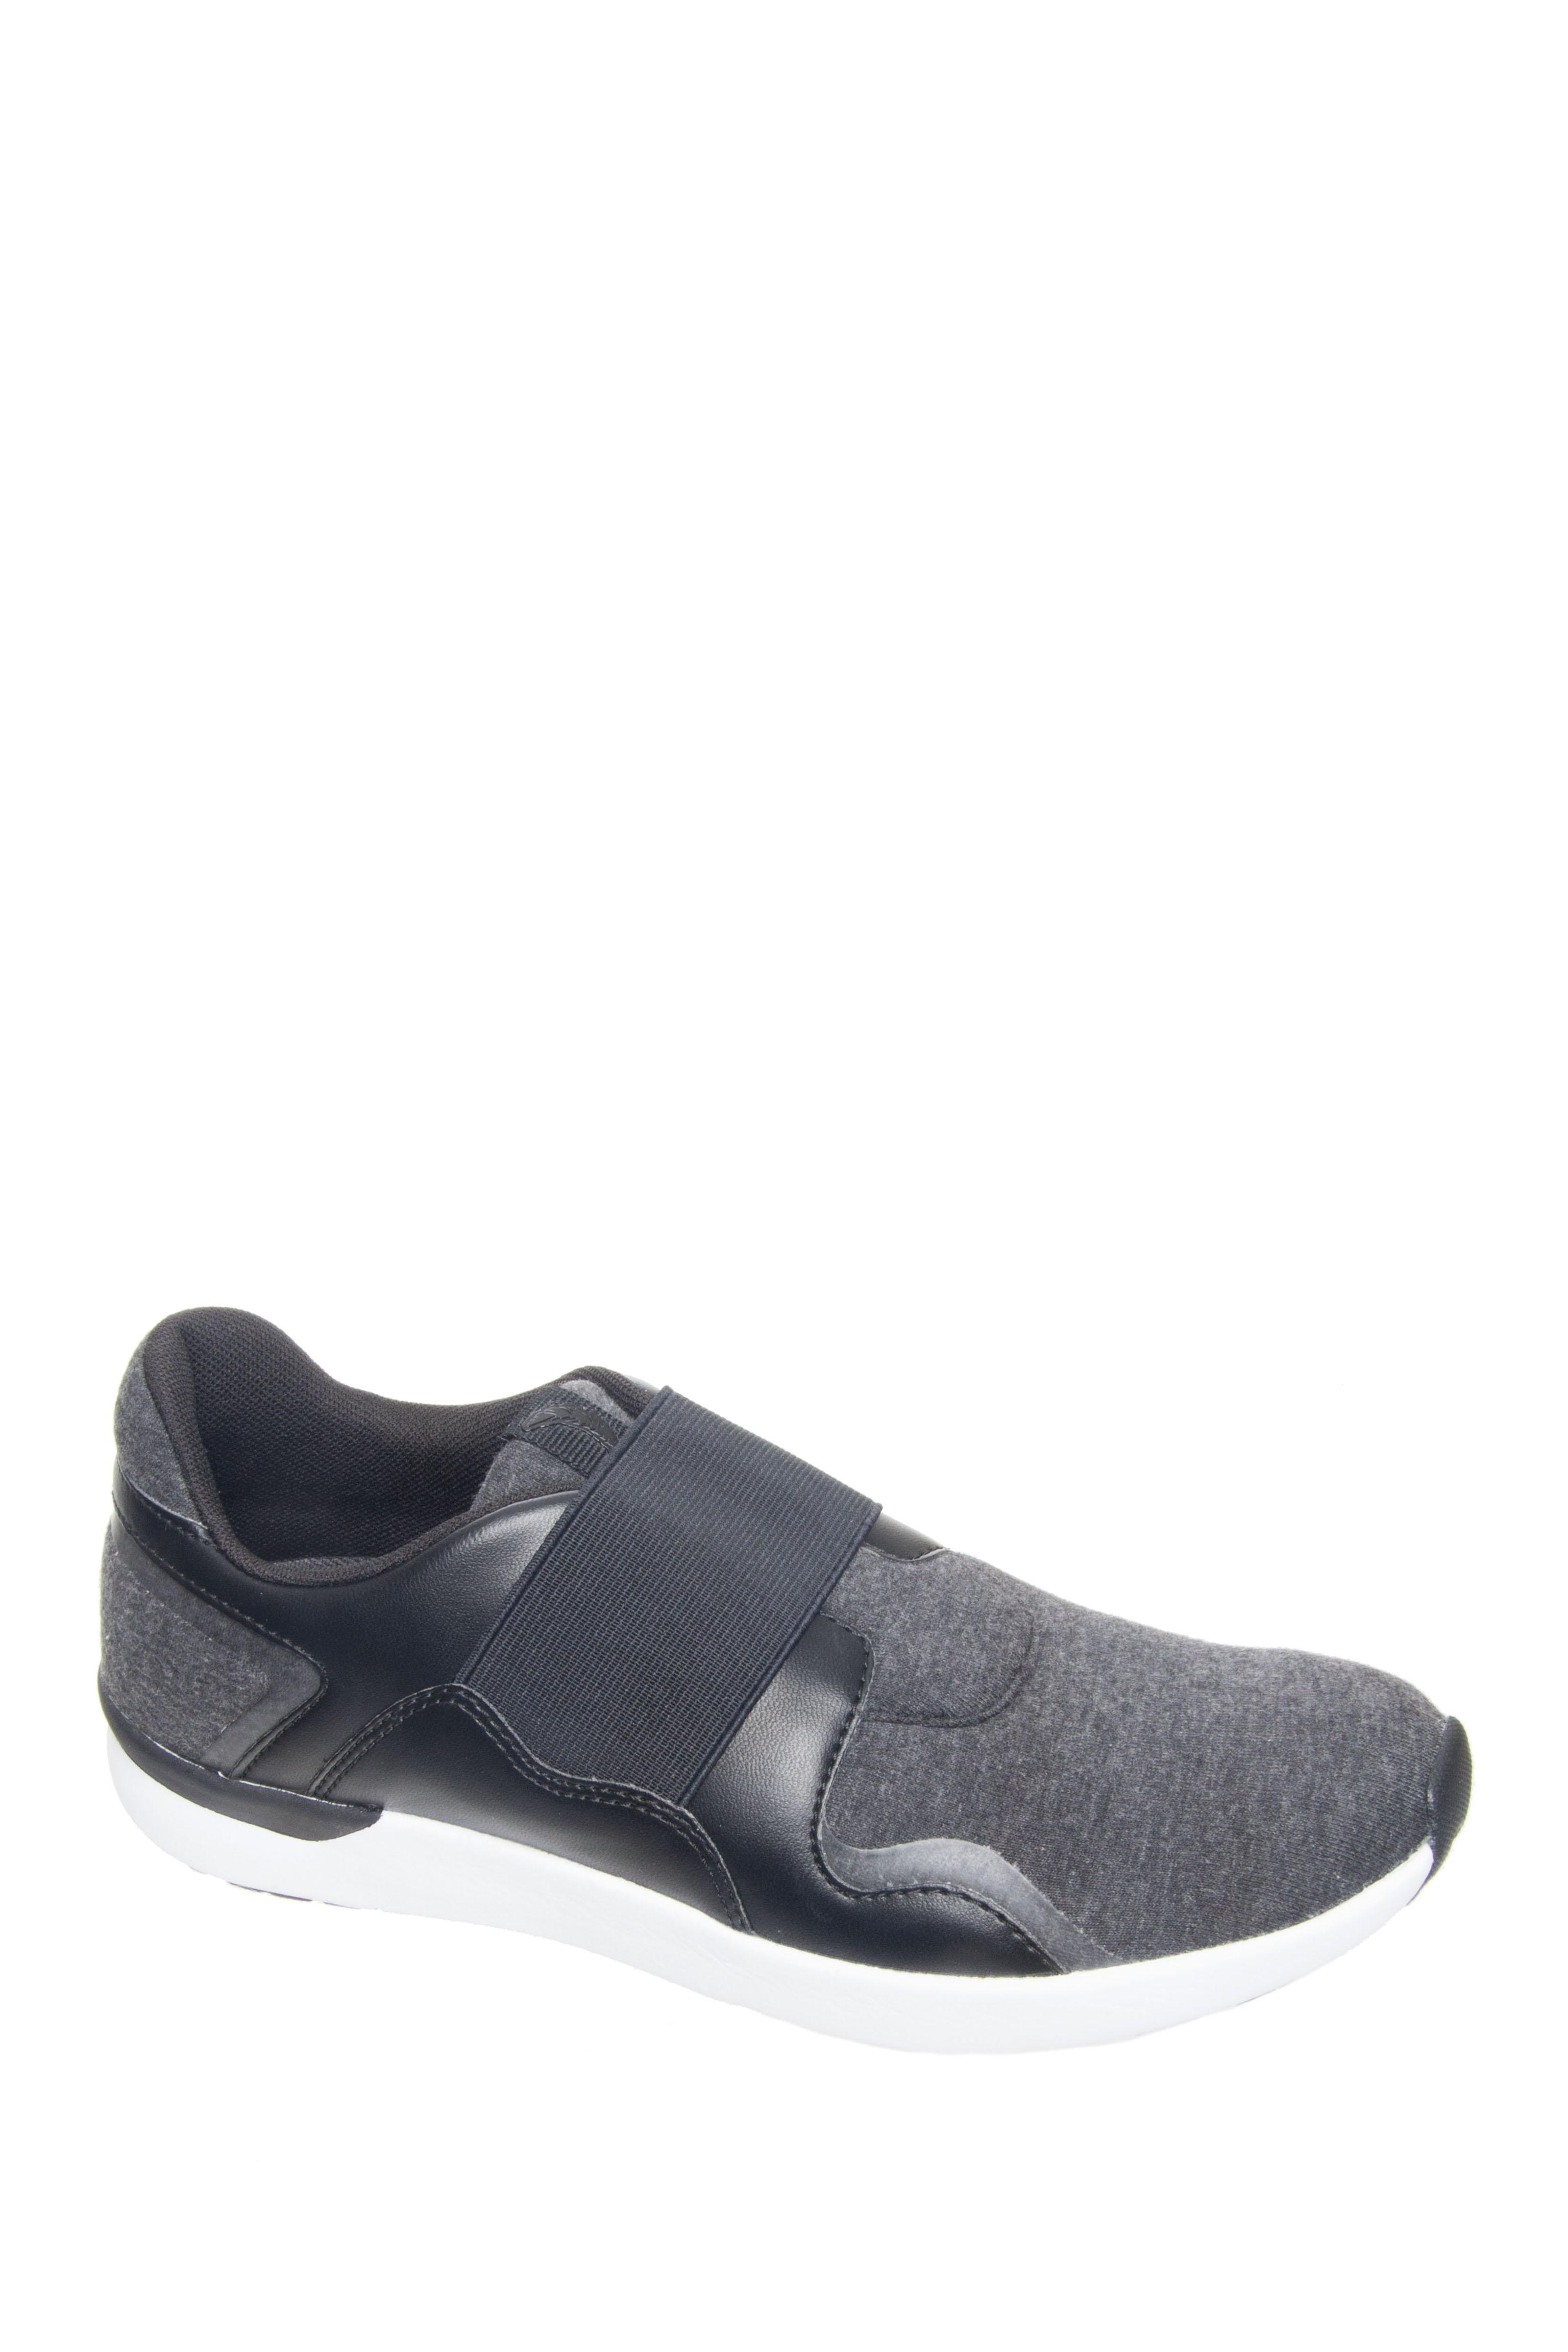 Jessica Simpson Fusto Low Top Sneakers - Black Heather